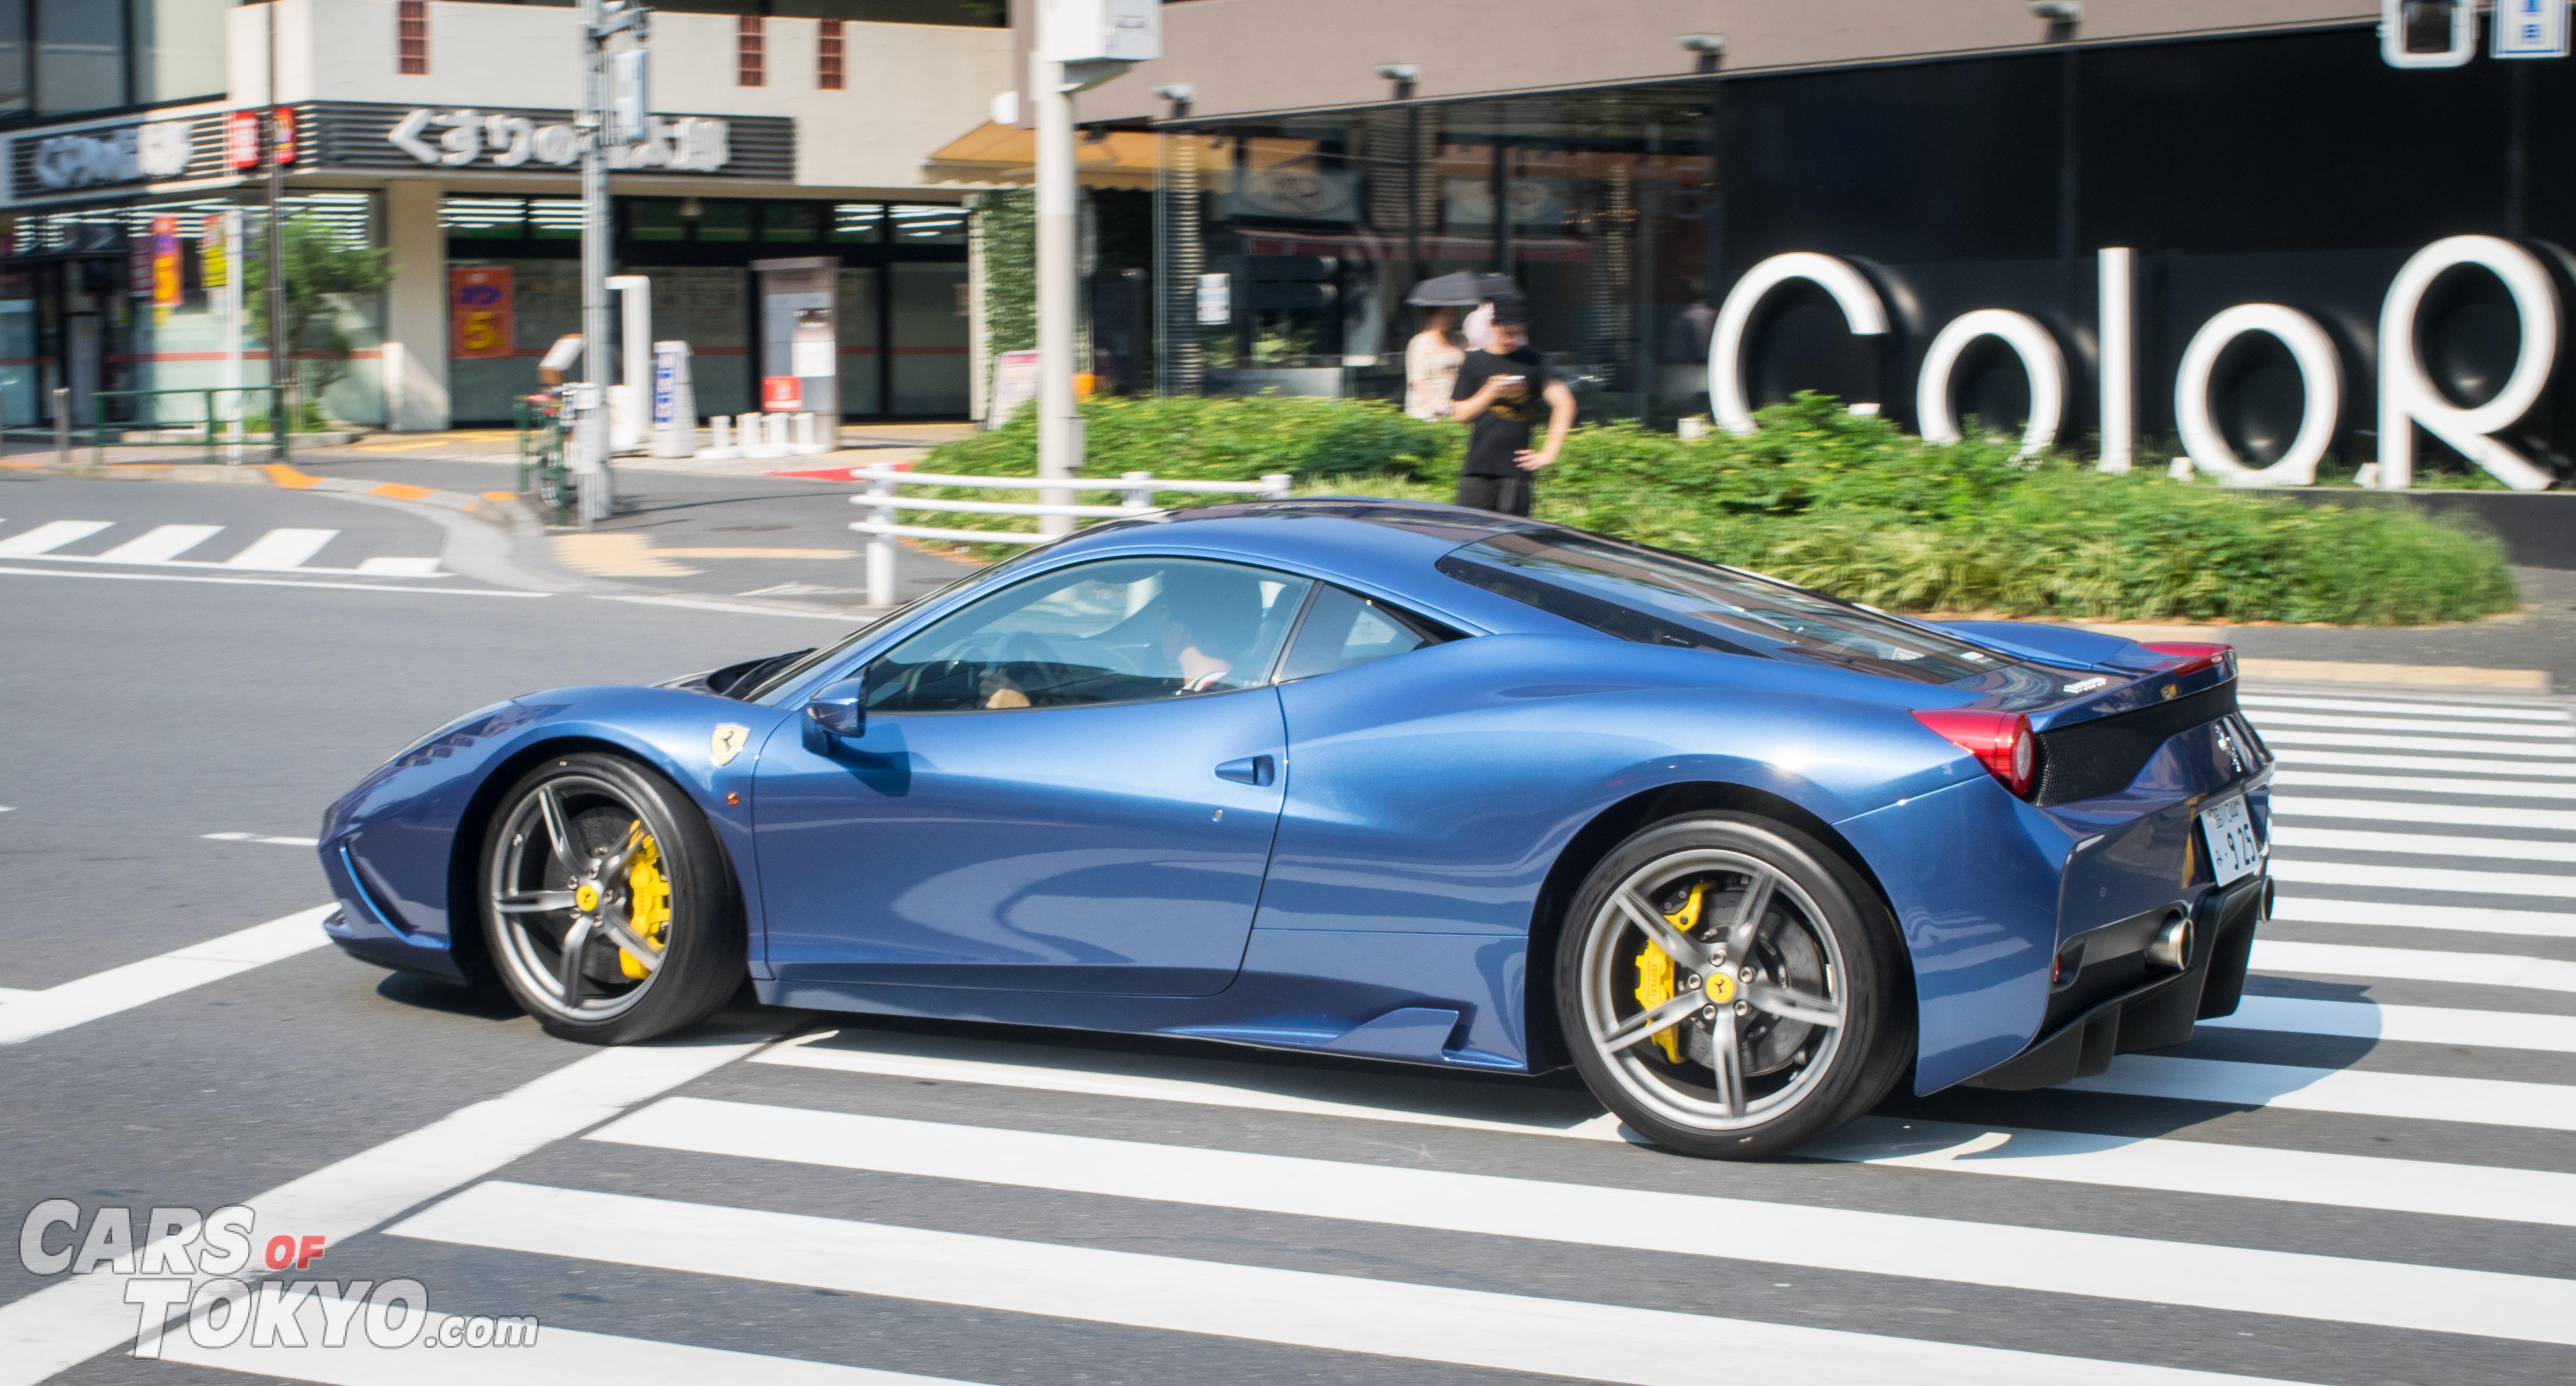 Cars of Tokyo Unusual Spec Ferrari 458 Speciale Blue